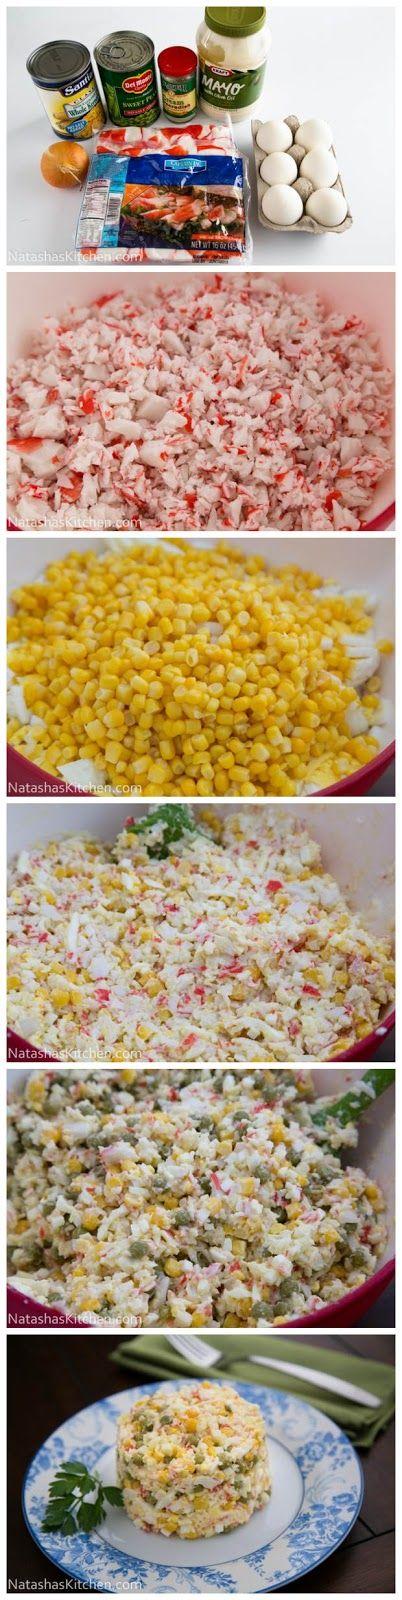 Crab Salad Recipe, no mayo though Greek yogurt.